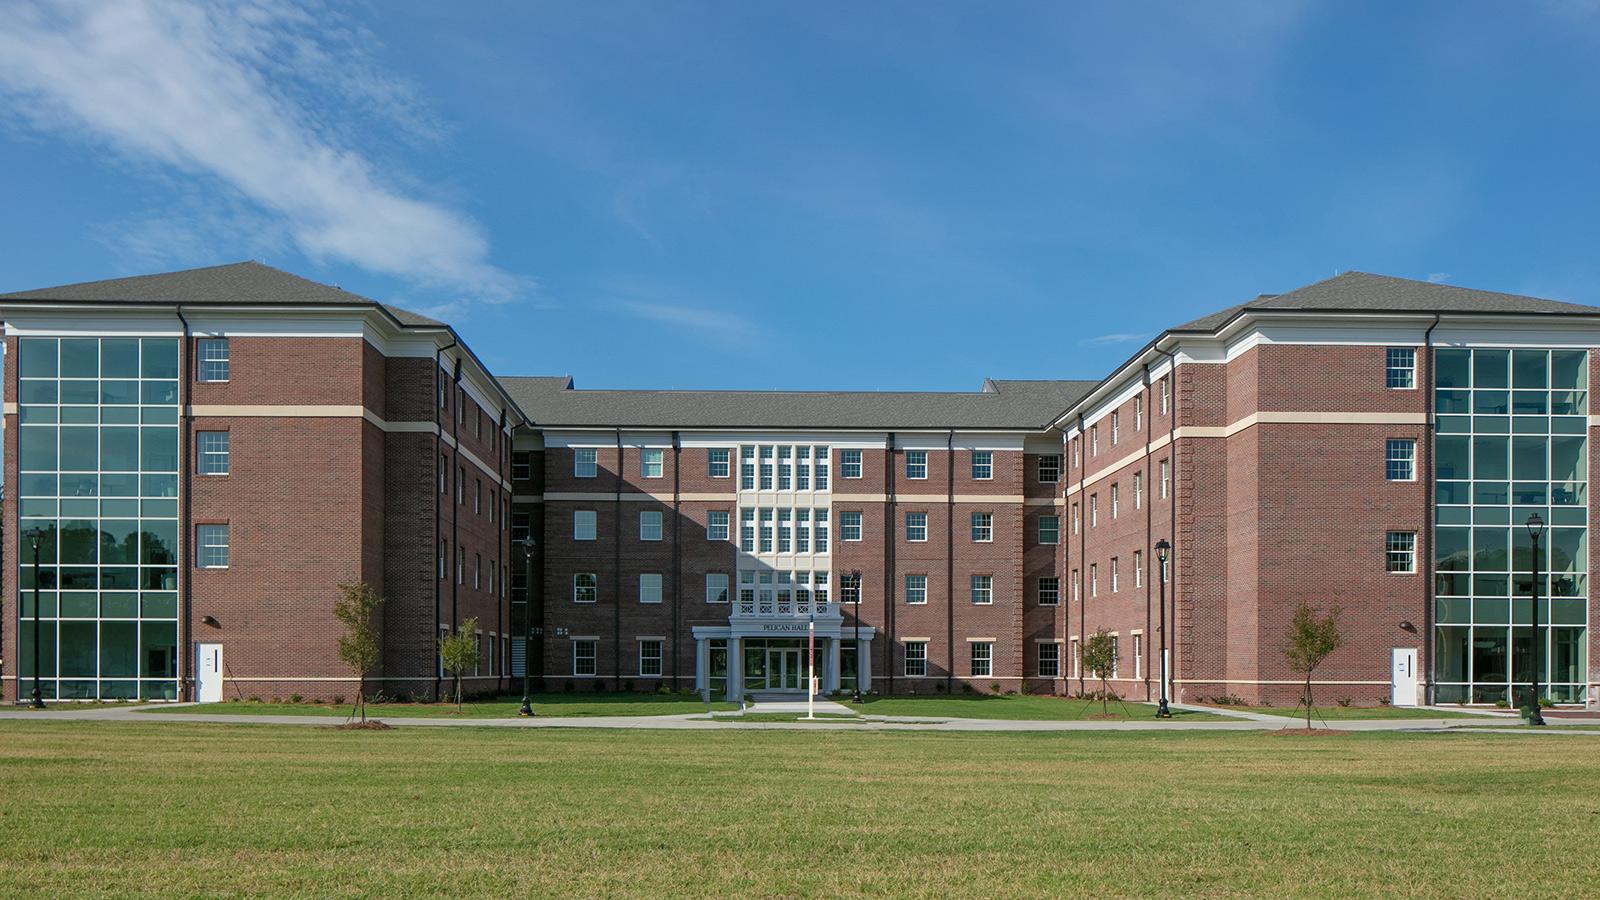 University of North Carolina at Wilmington Housing Village Exterior